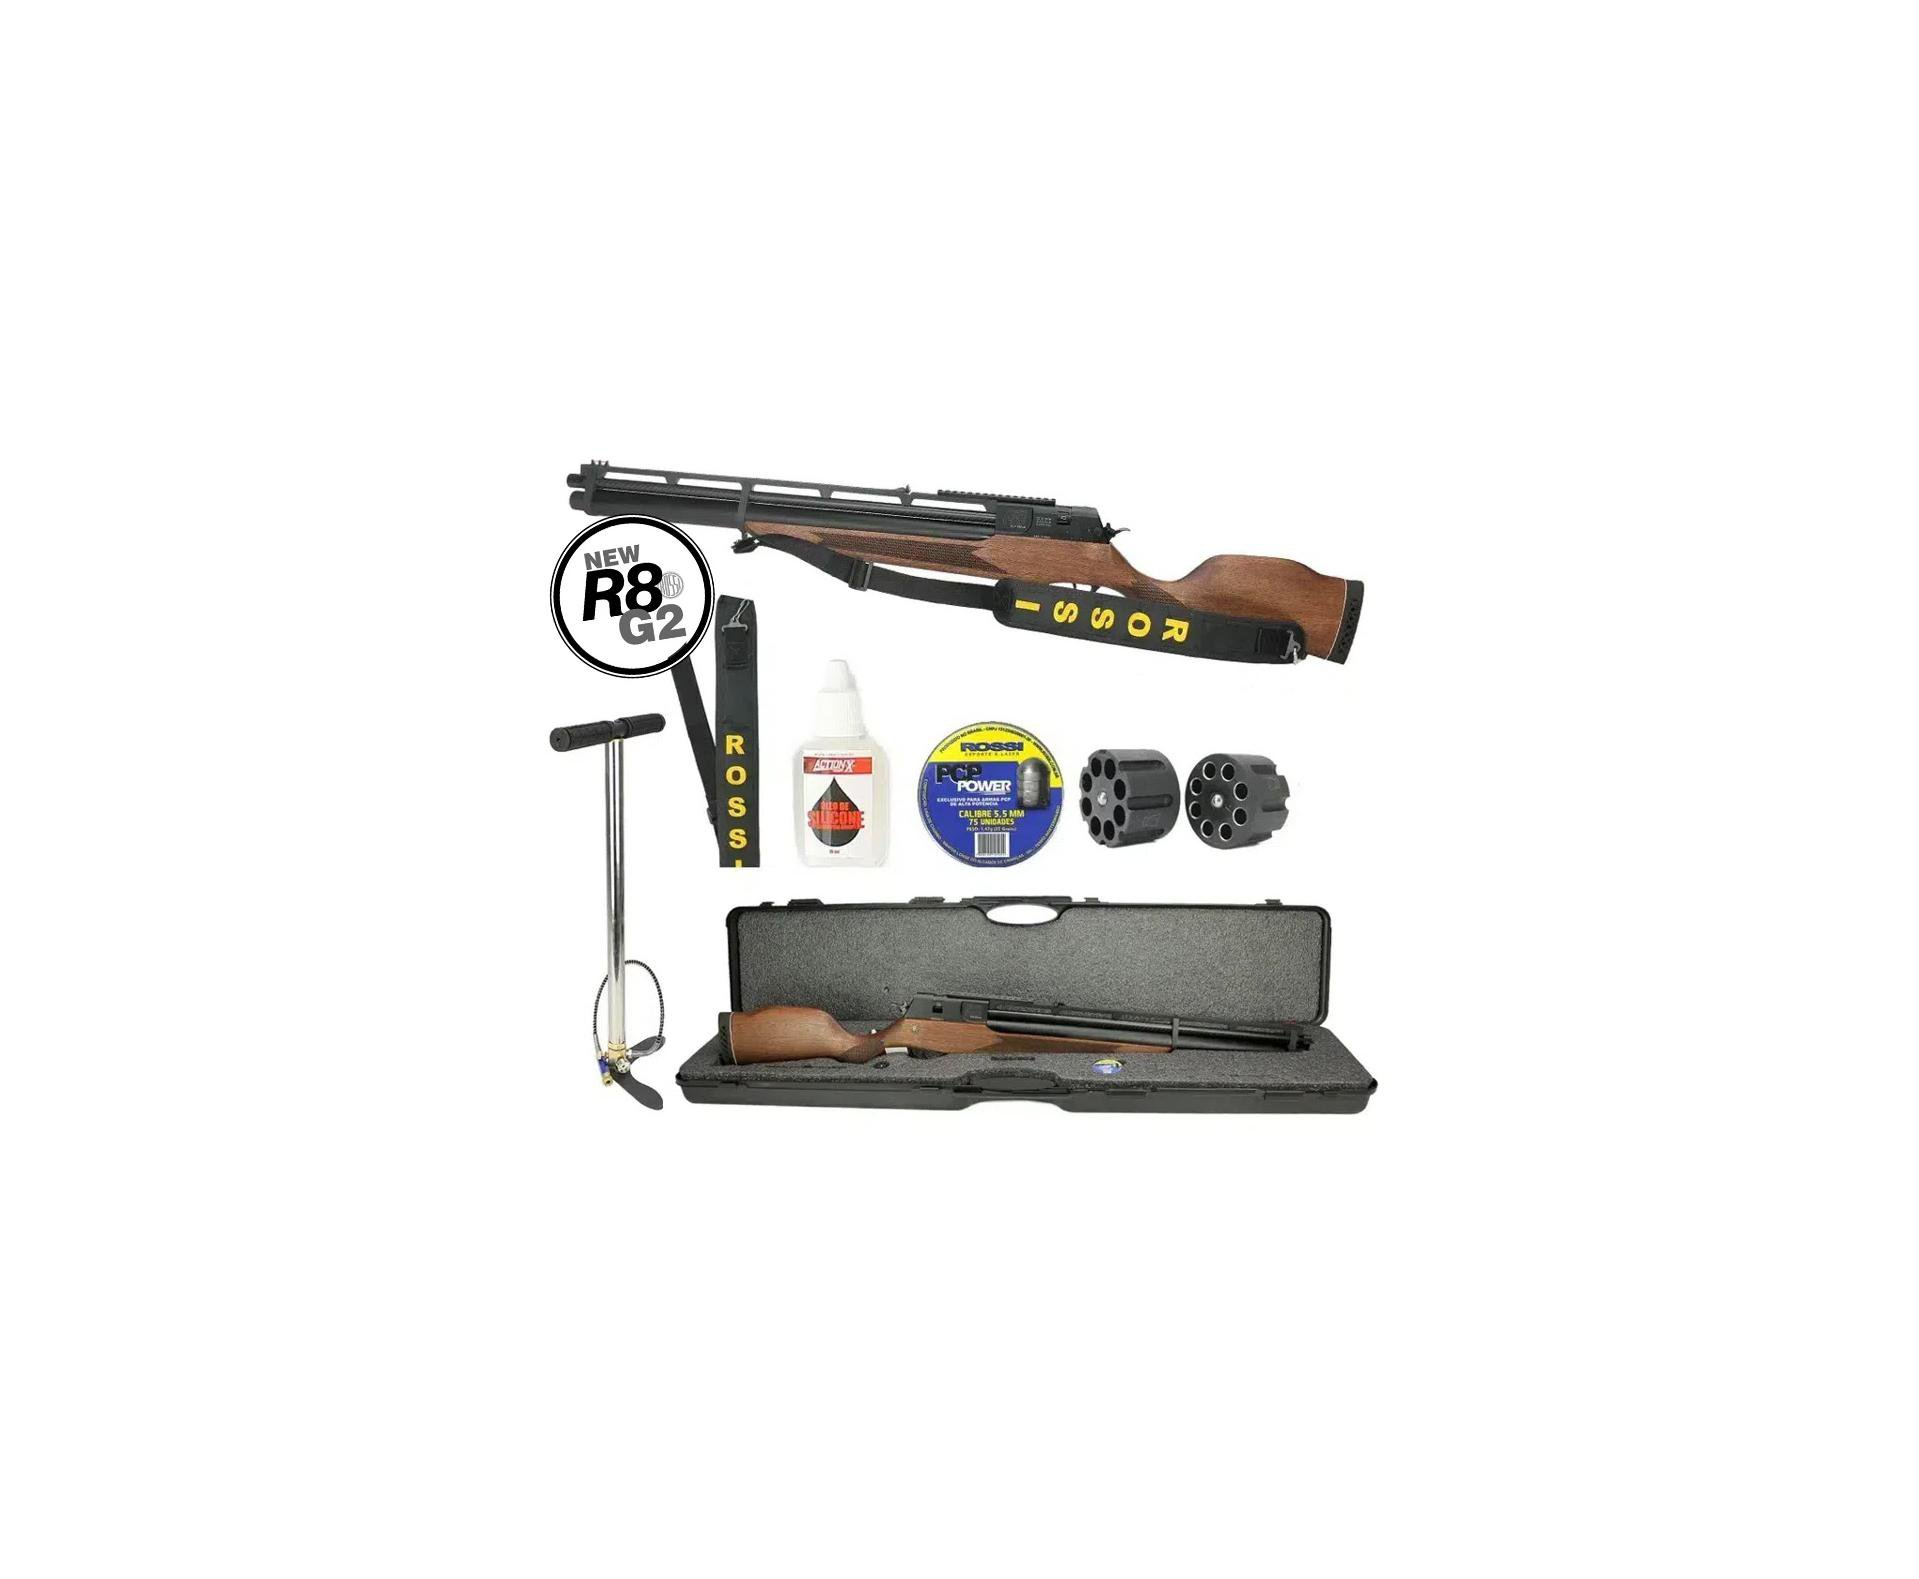 Carabina De Pressão Pcp Rossi R8 8 Tiros 5,5mm 350 M/s + Bomba Hand Pump